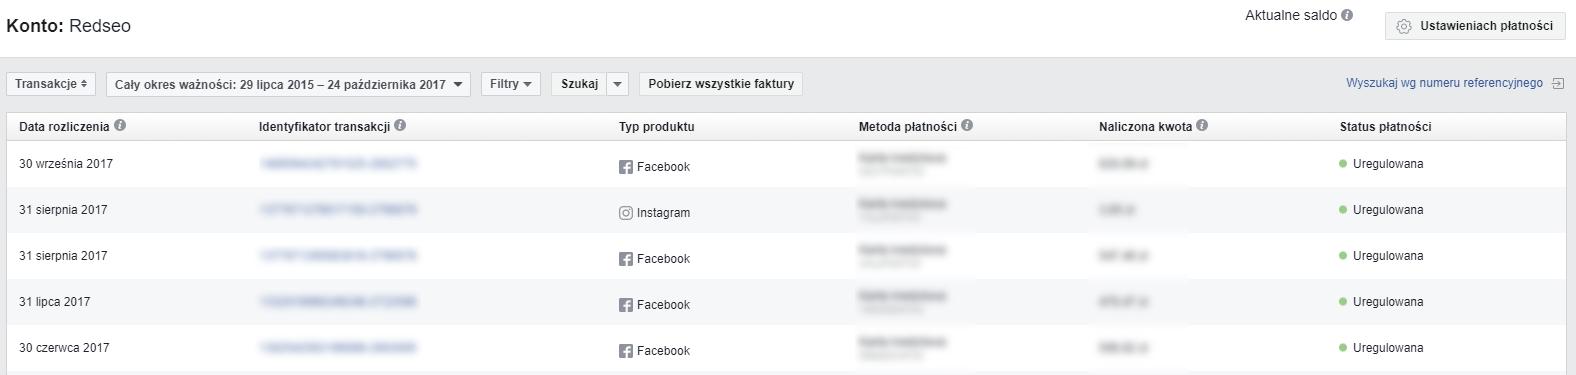 Pobieranie faktur z Facebooka